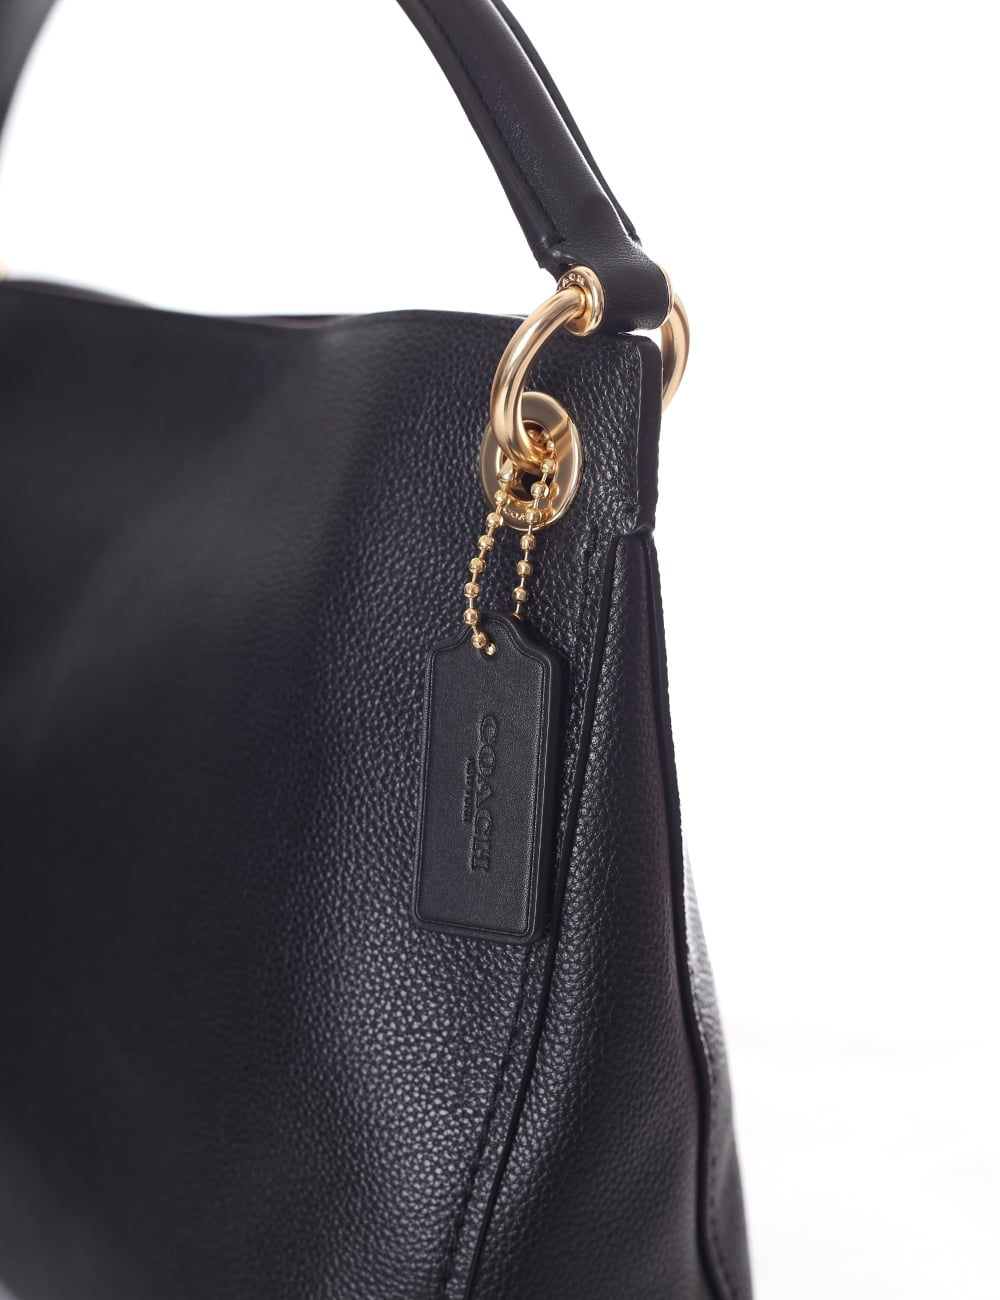 be098b832dd0 Coach Clarkson Women s Hobo Bag